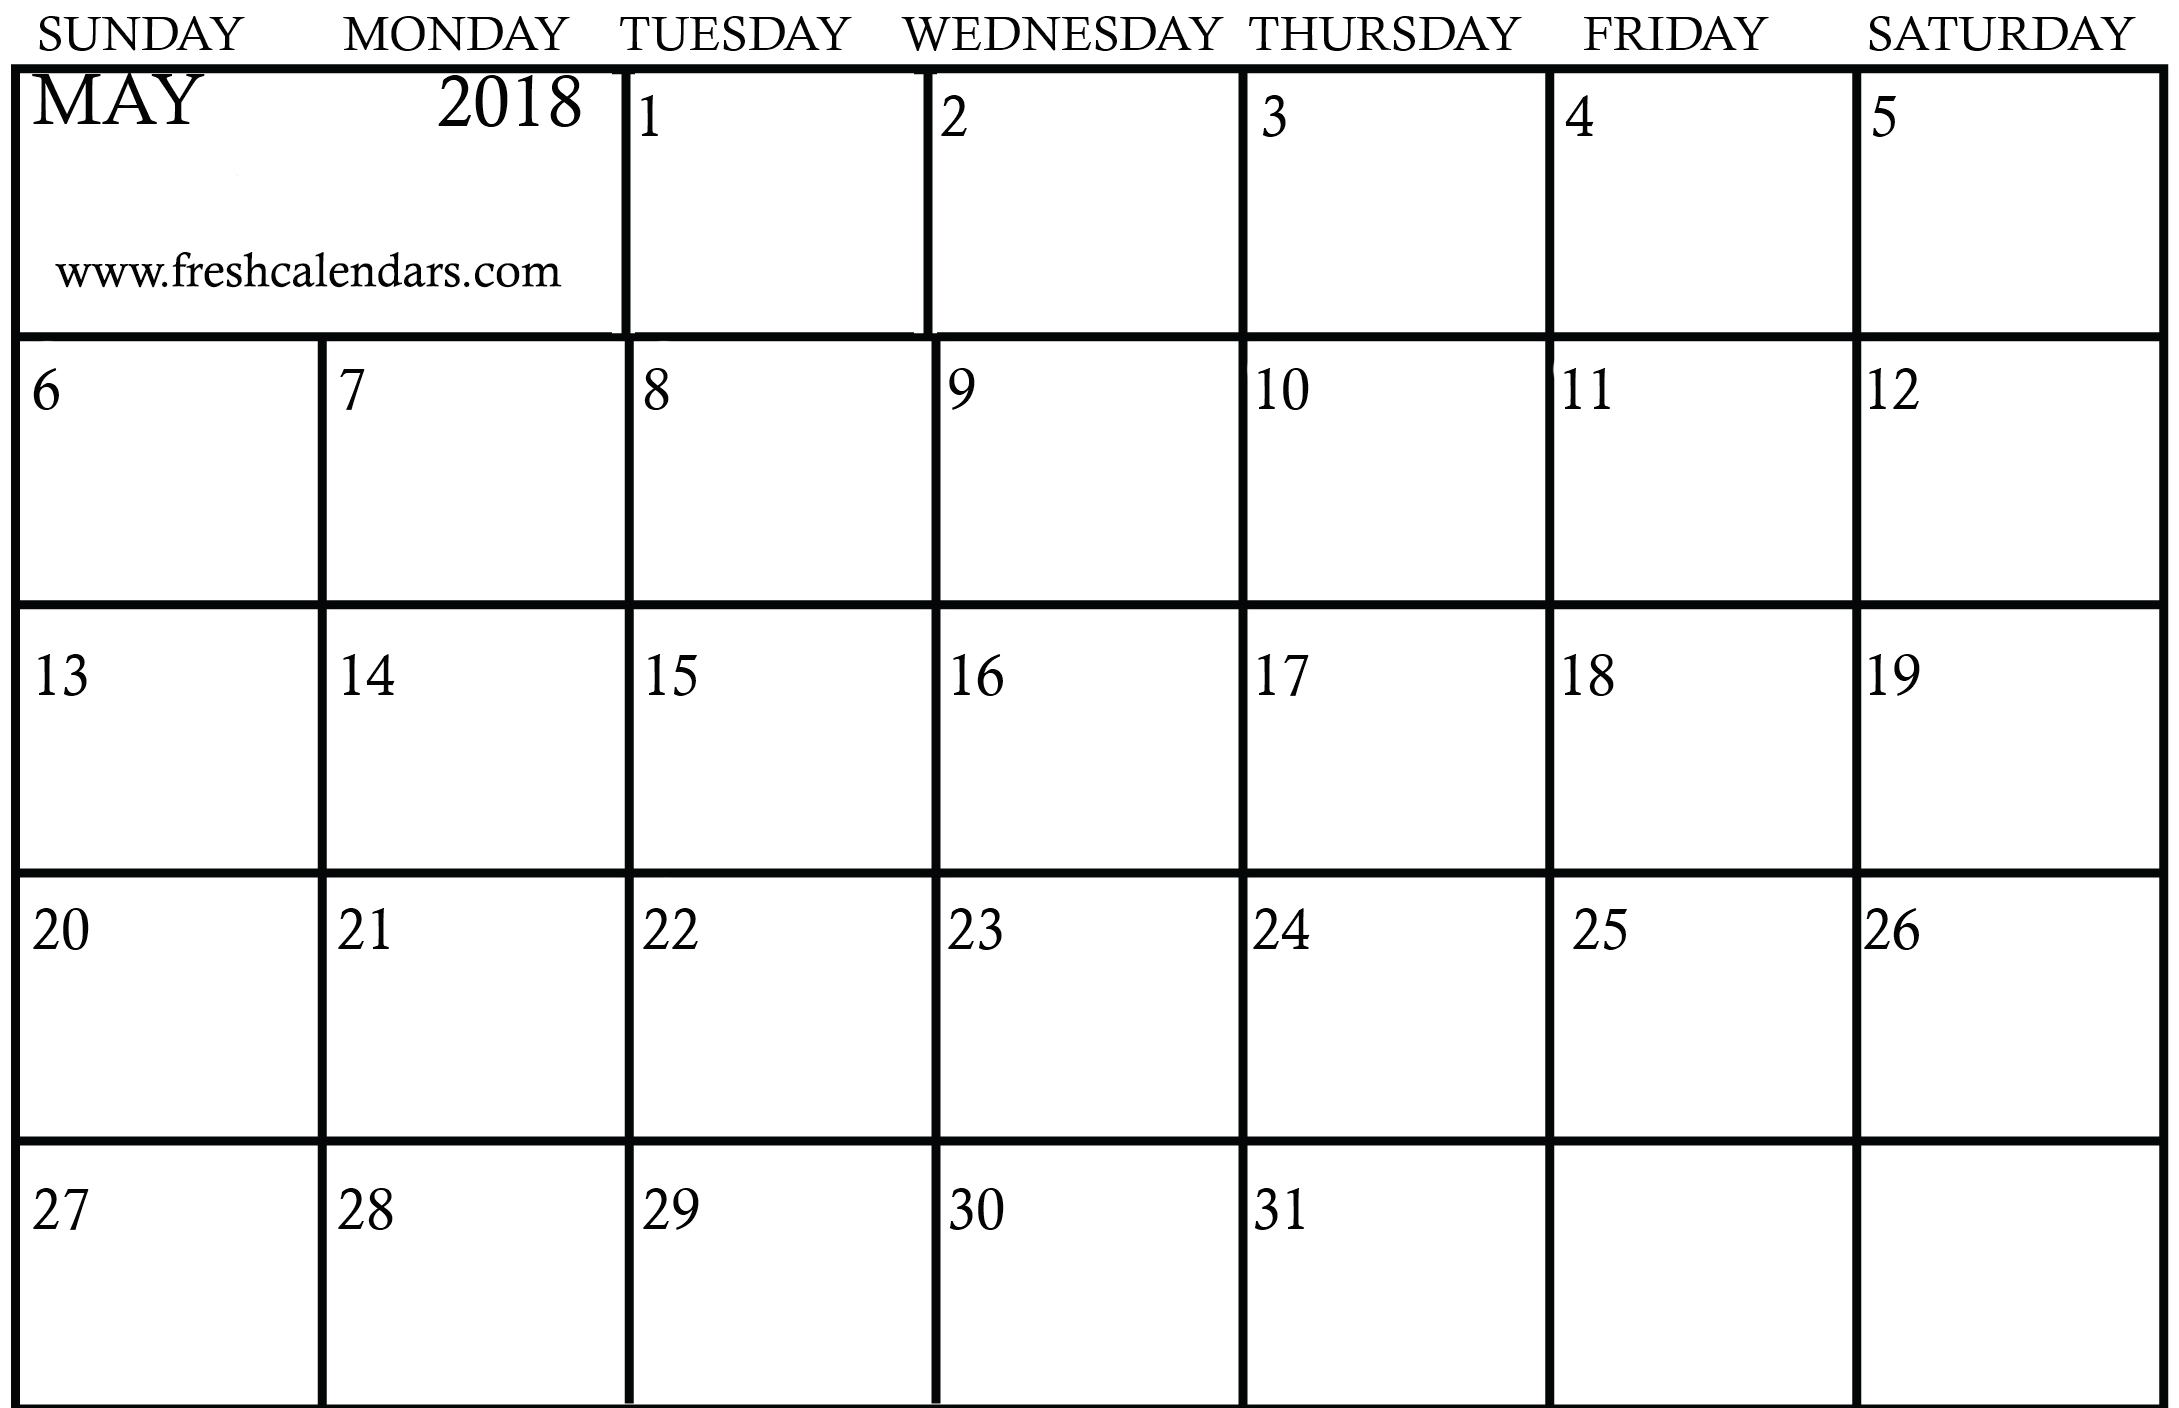 blank printable calendar 2018 may